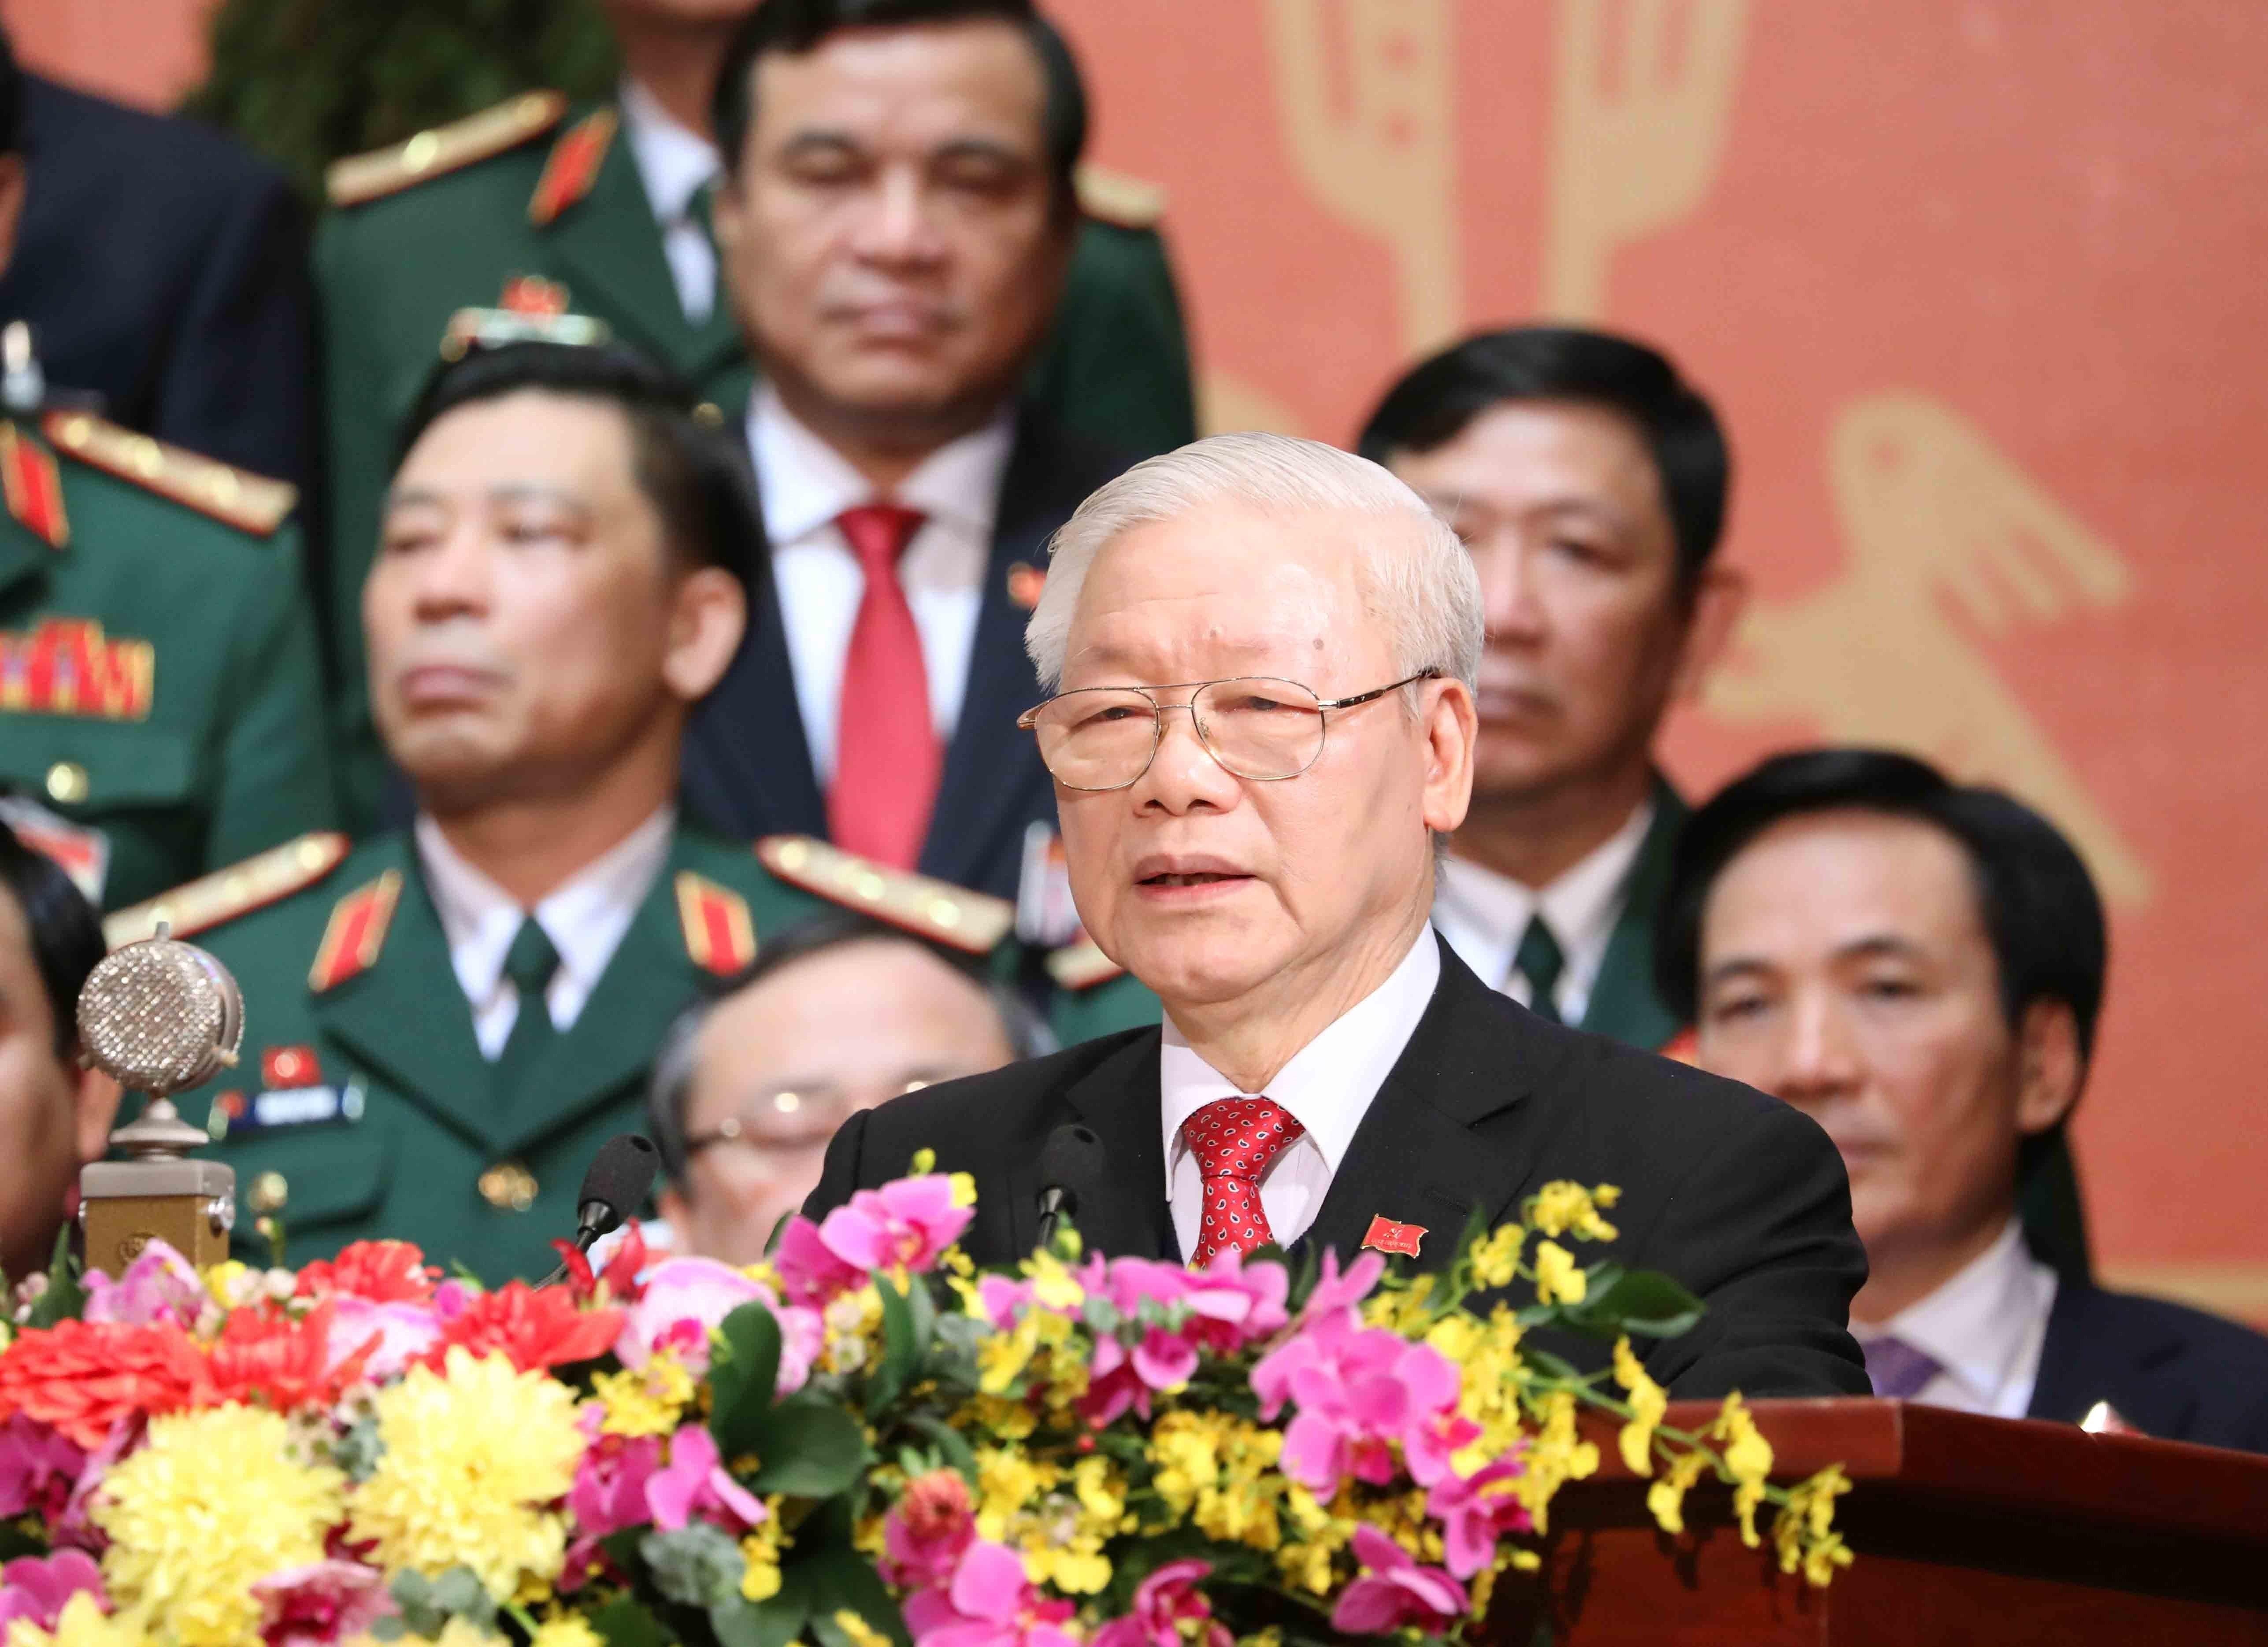 Nhin lai Dai hoi XIII cua Dang Cong san Viet Nam: Vung mot niem tin hinh anh 1